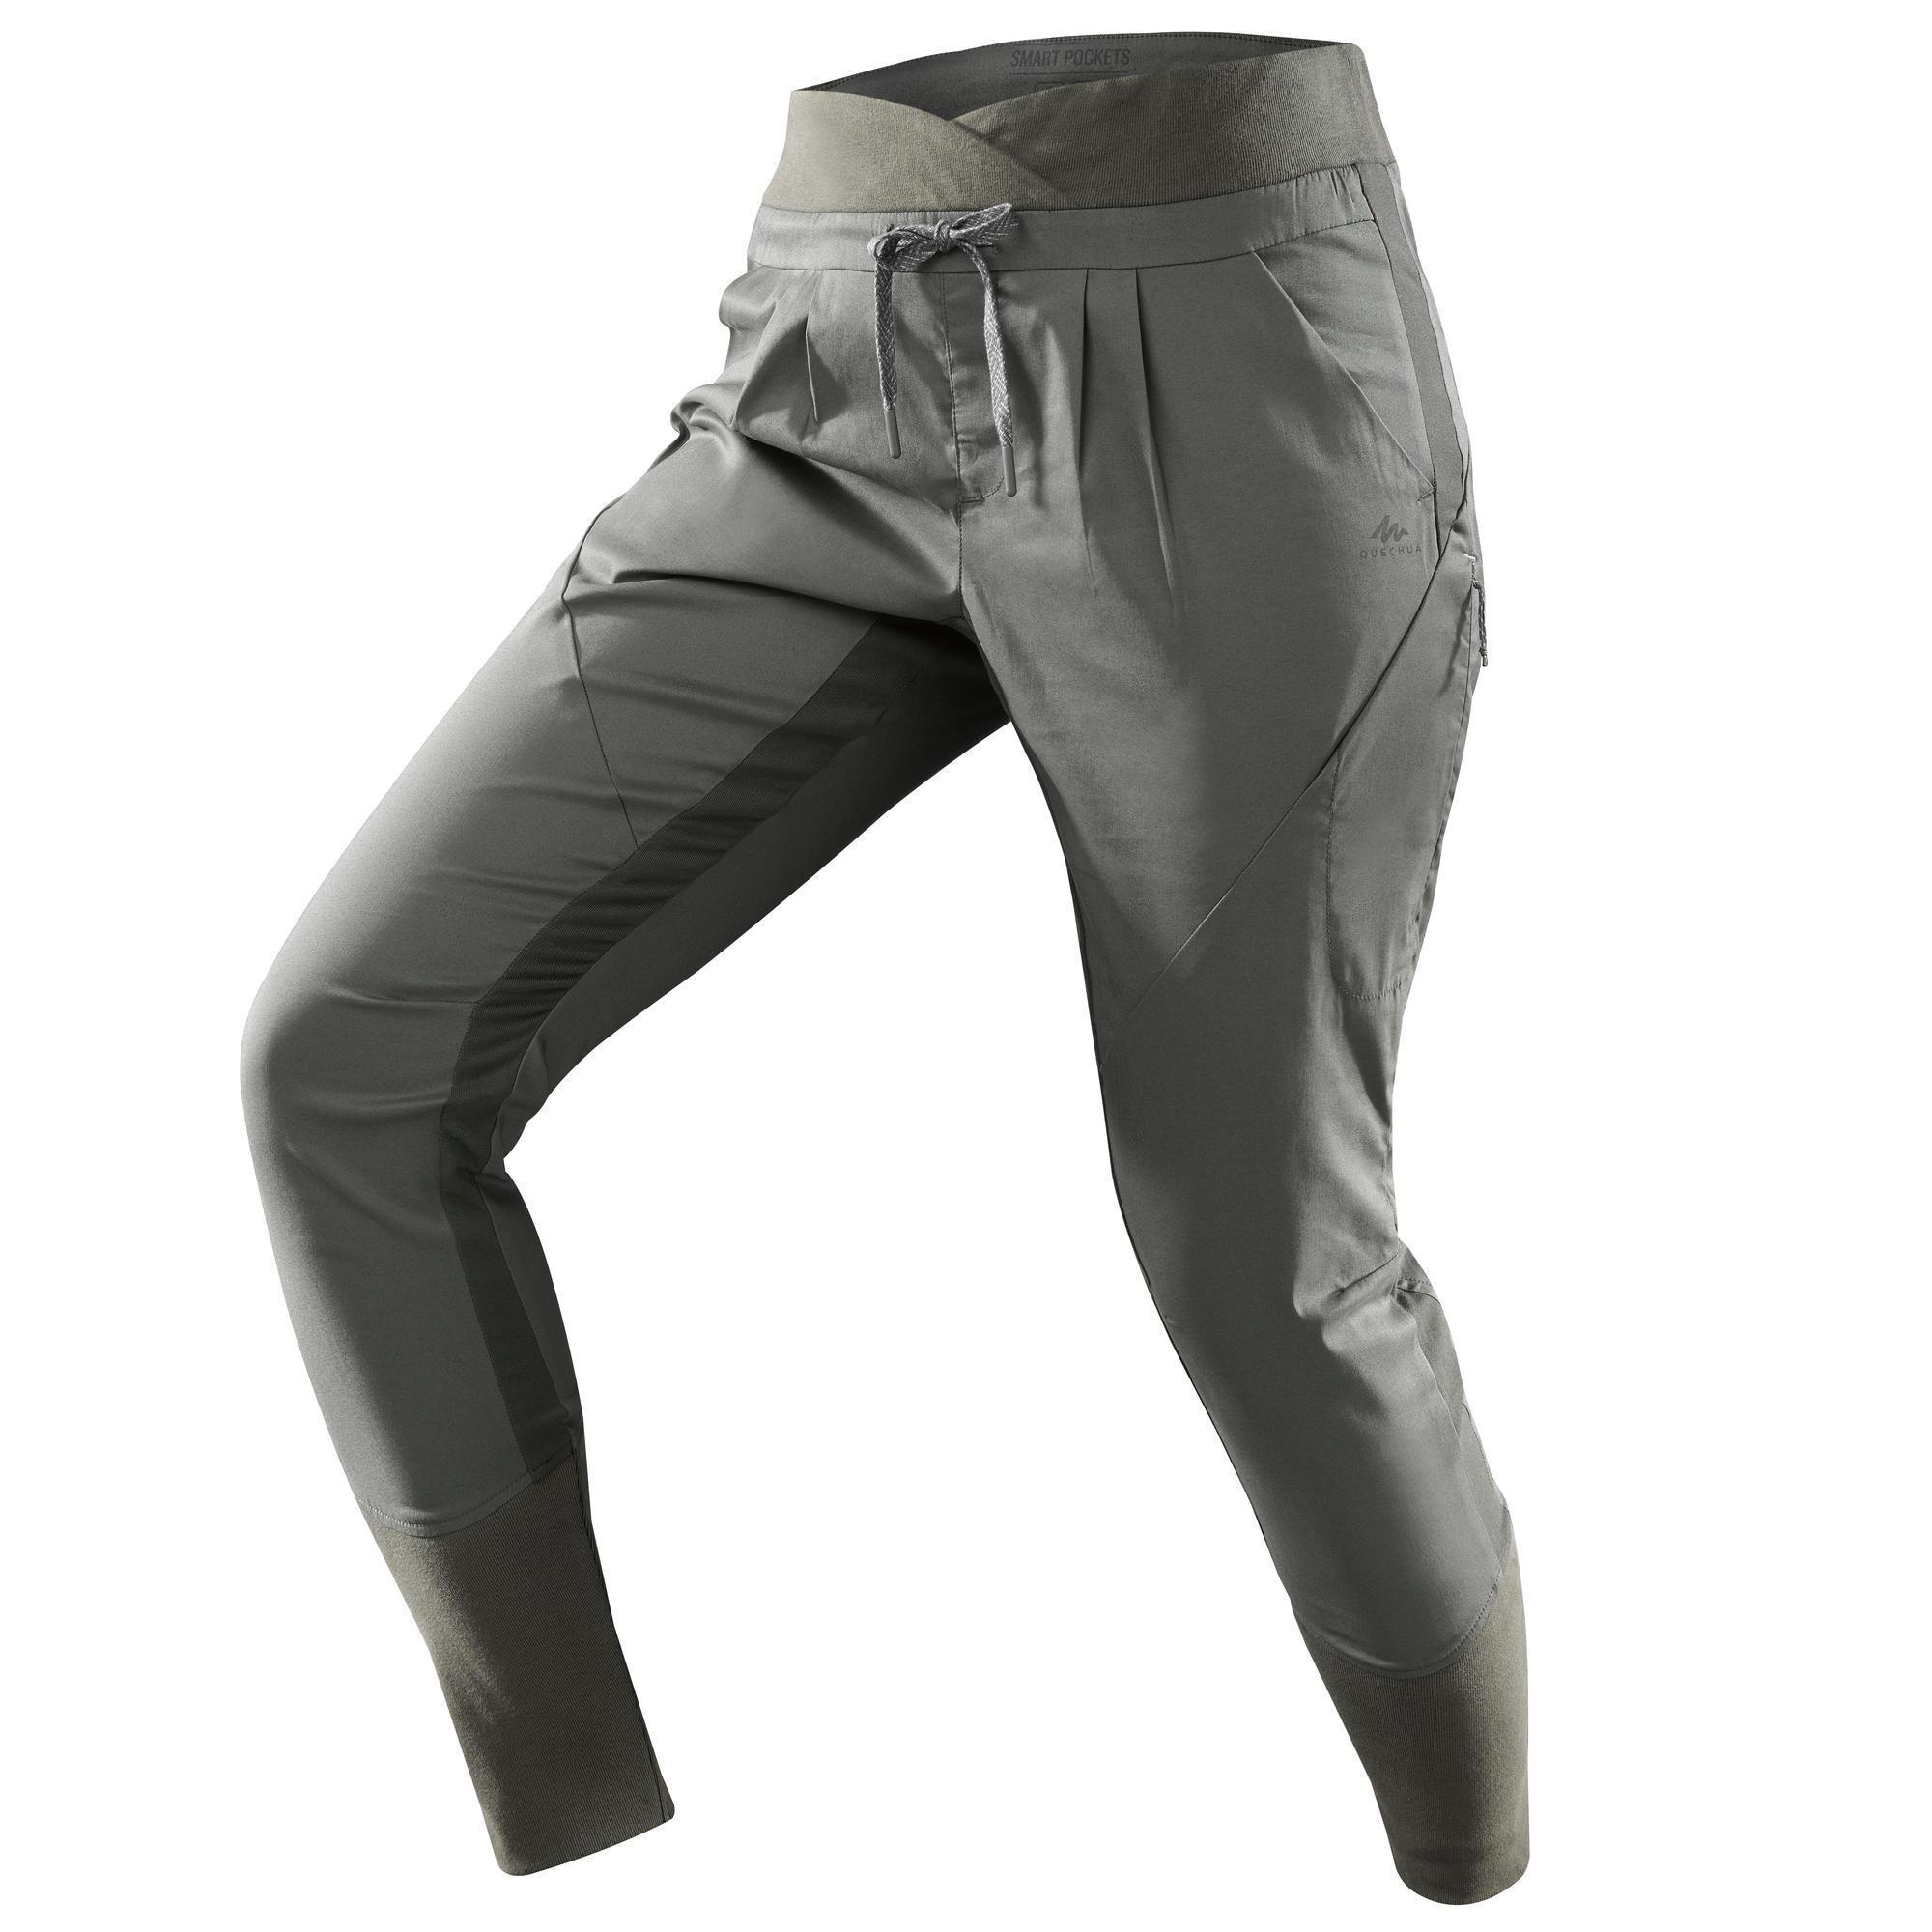 Wanderhose NH500 Fit Damen kaki für Naturwanderungen | Bekleidung > Hosen > Outdoorhosen | Grün - Khaki | Quechua